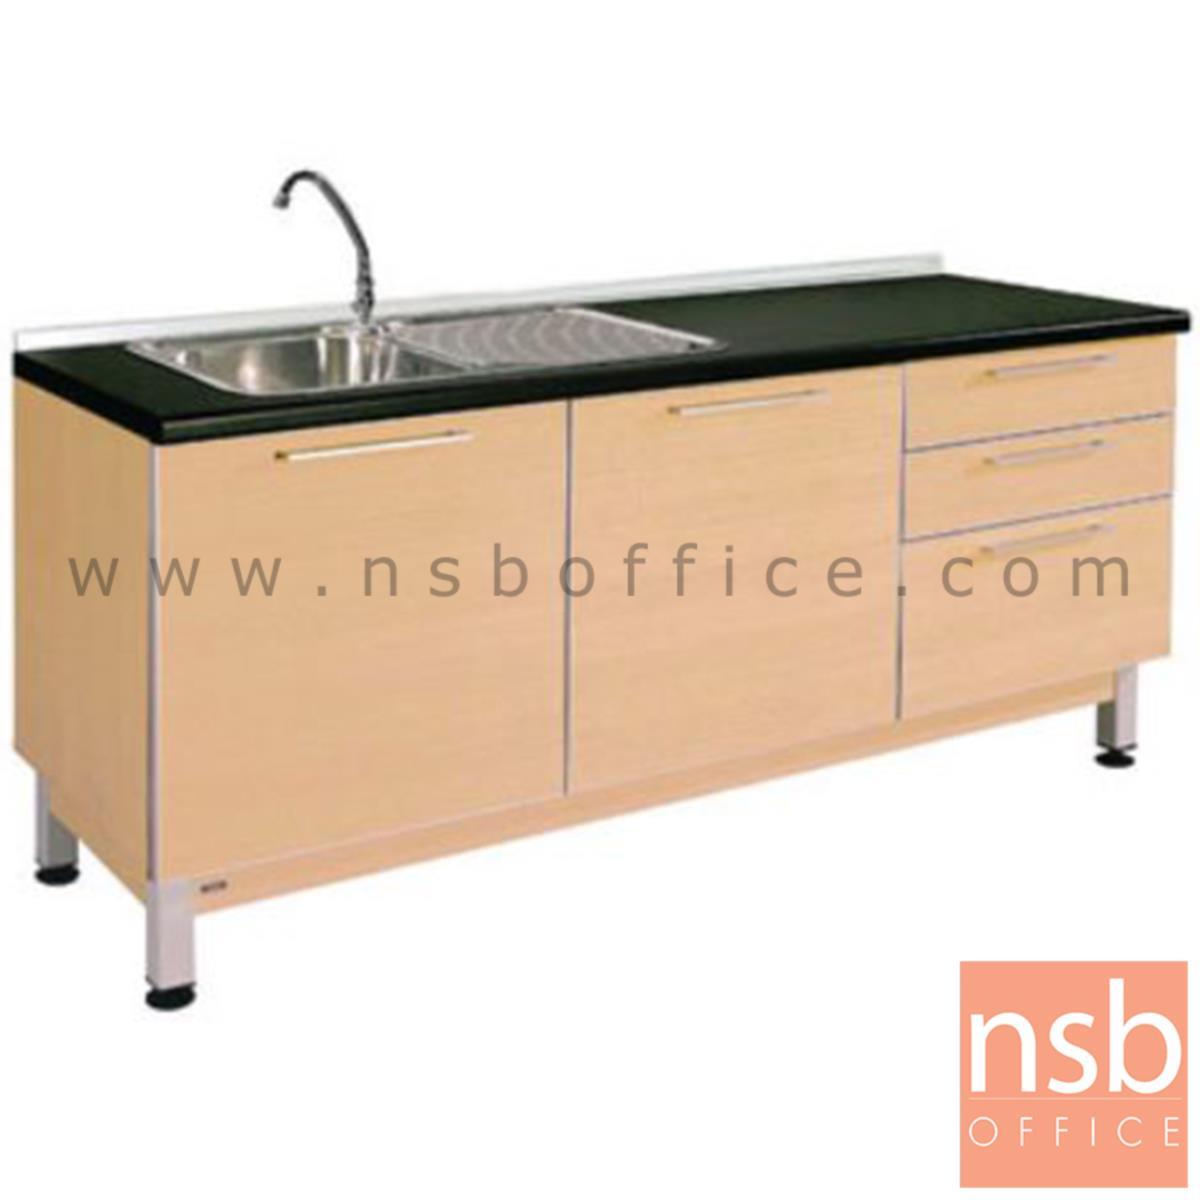 K02A003:ตู้ครัวเคาน์เตอร์สีบีทดำ 180 cm.   พร้อมซิงค์ล้างจาน (สำหรับครัวเปียกและครัวแห้ง)